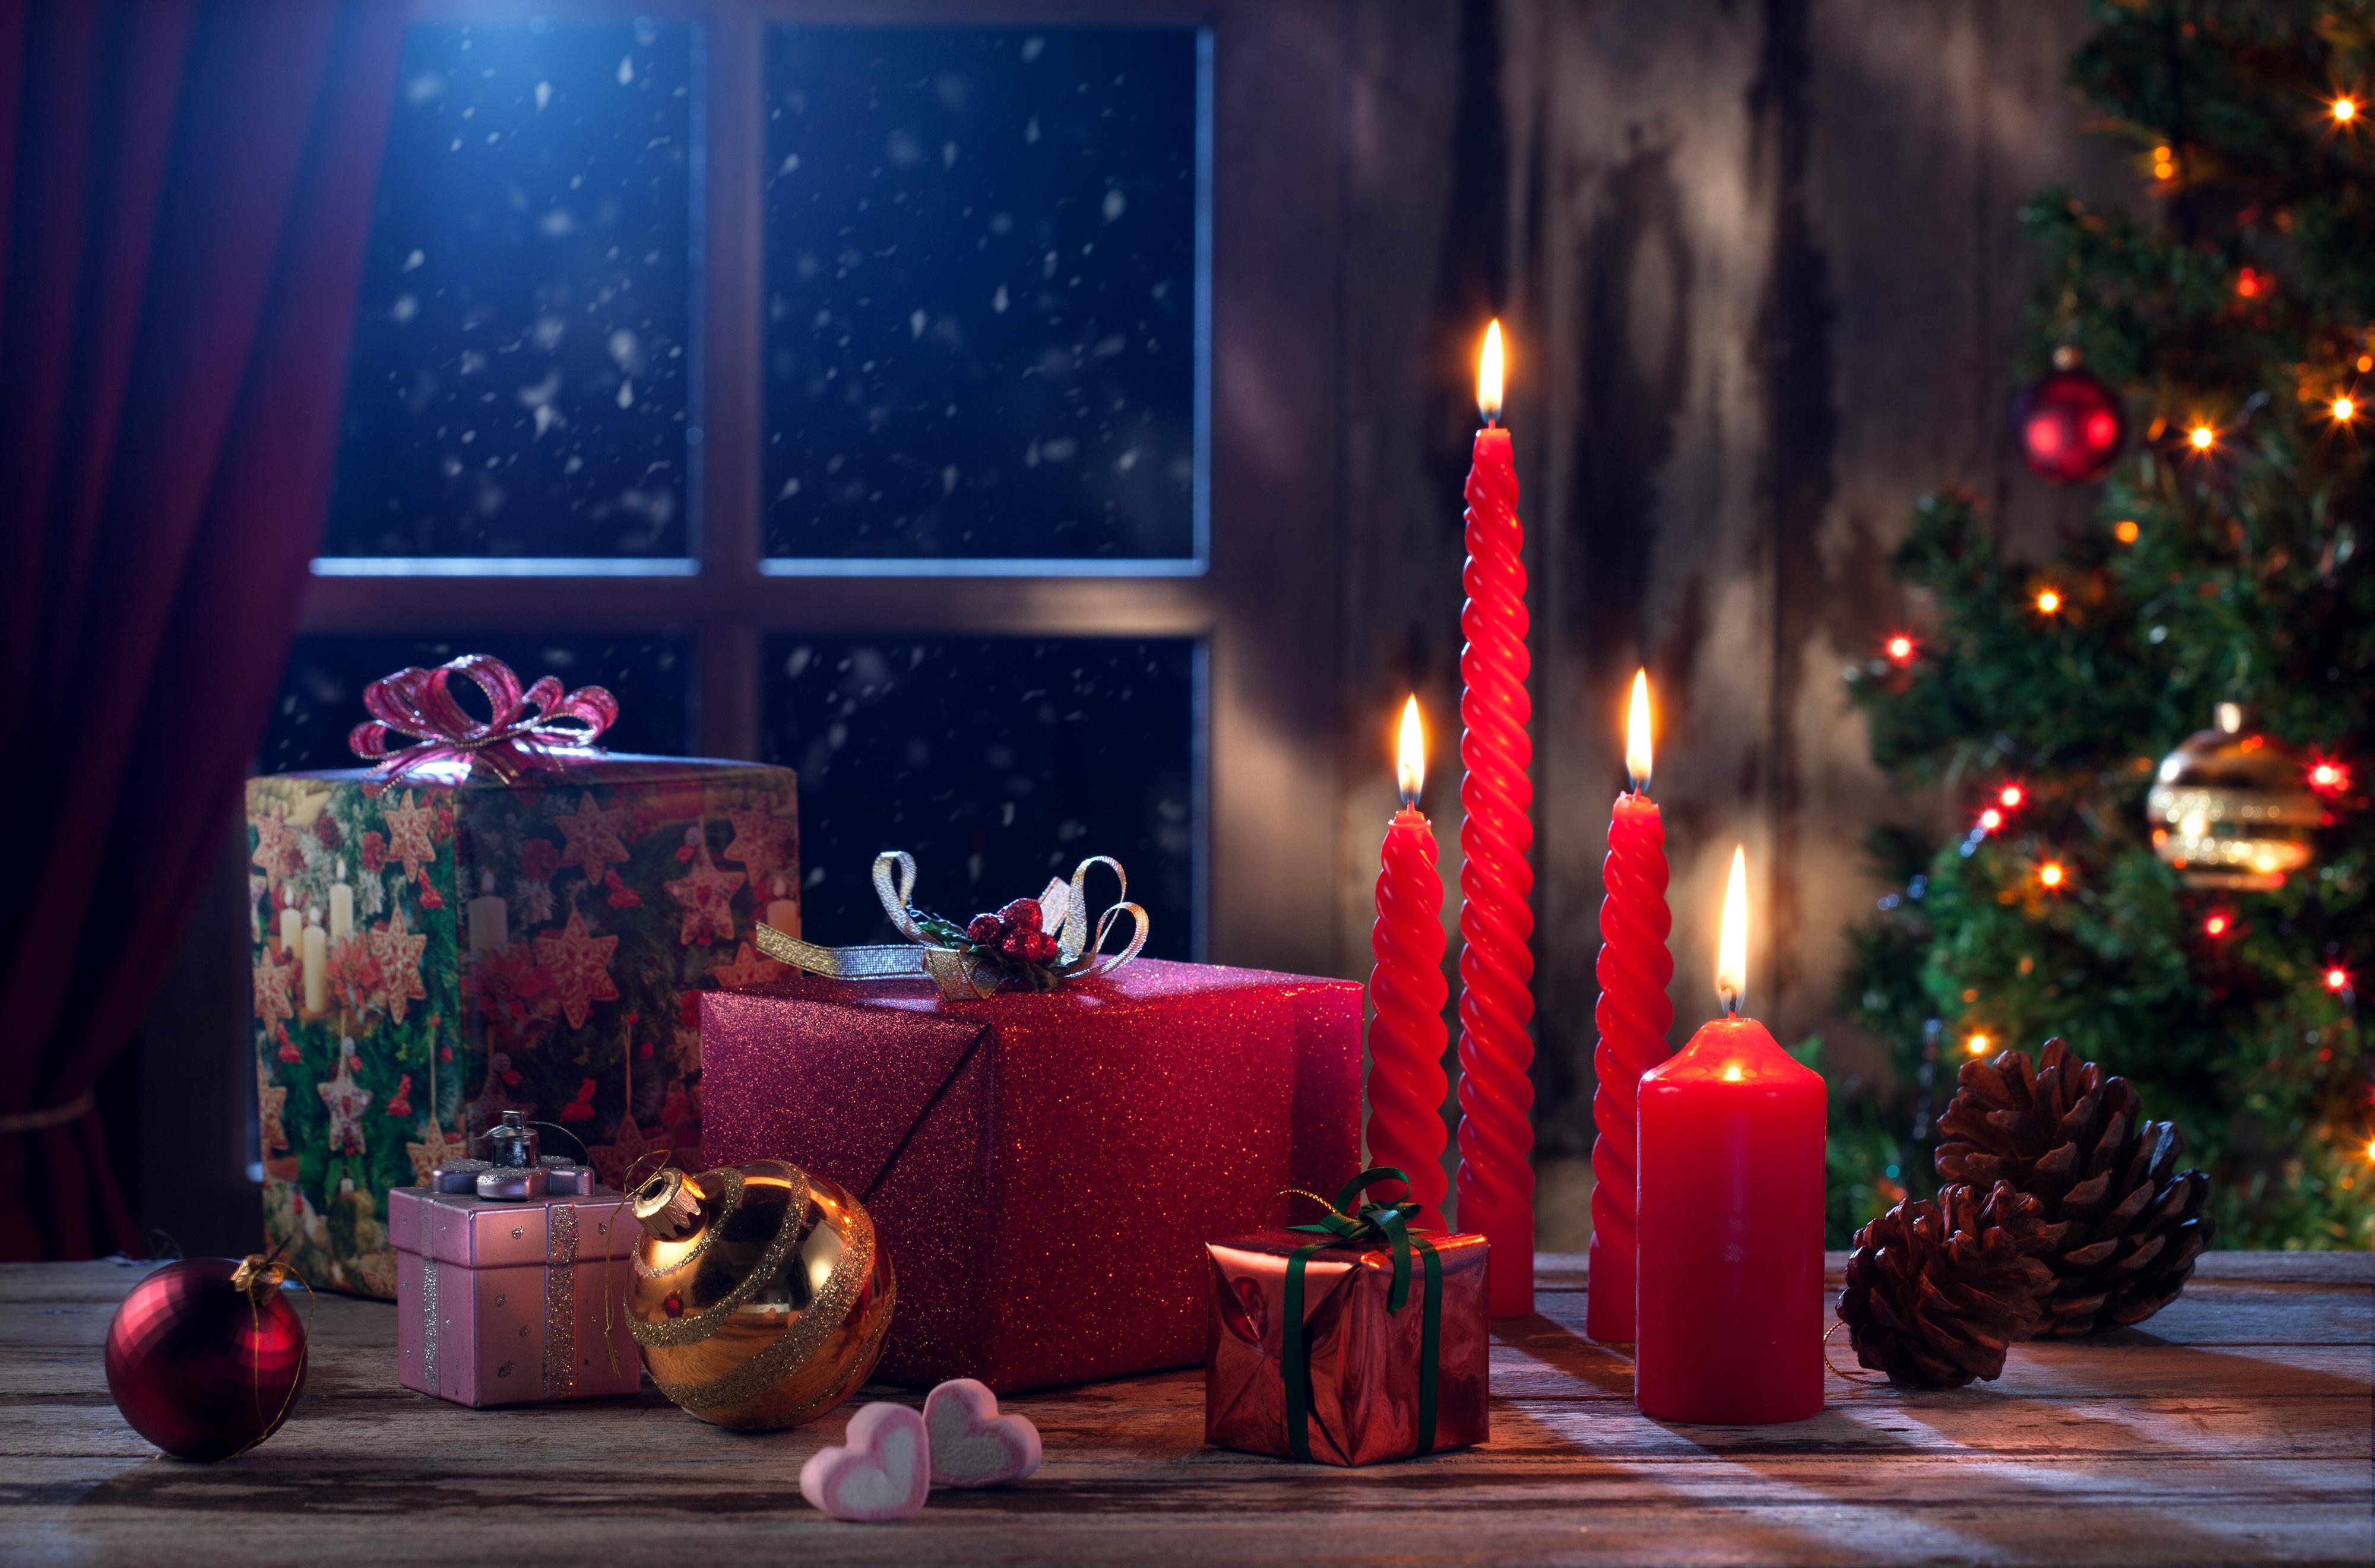 Noël 4k Ultra Fond D écran Hd Arrière Plan 4000x2641